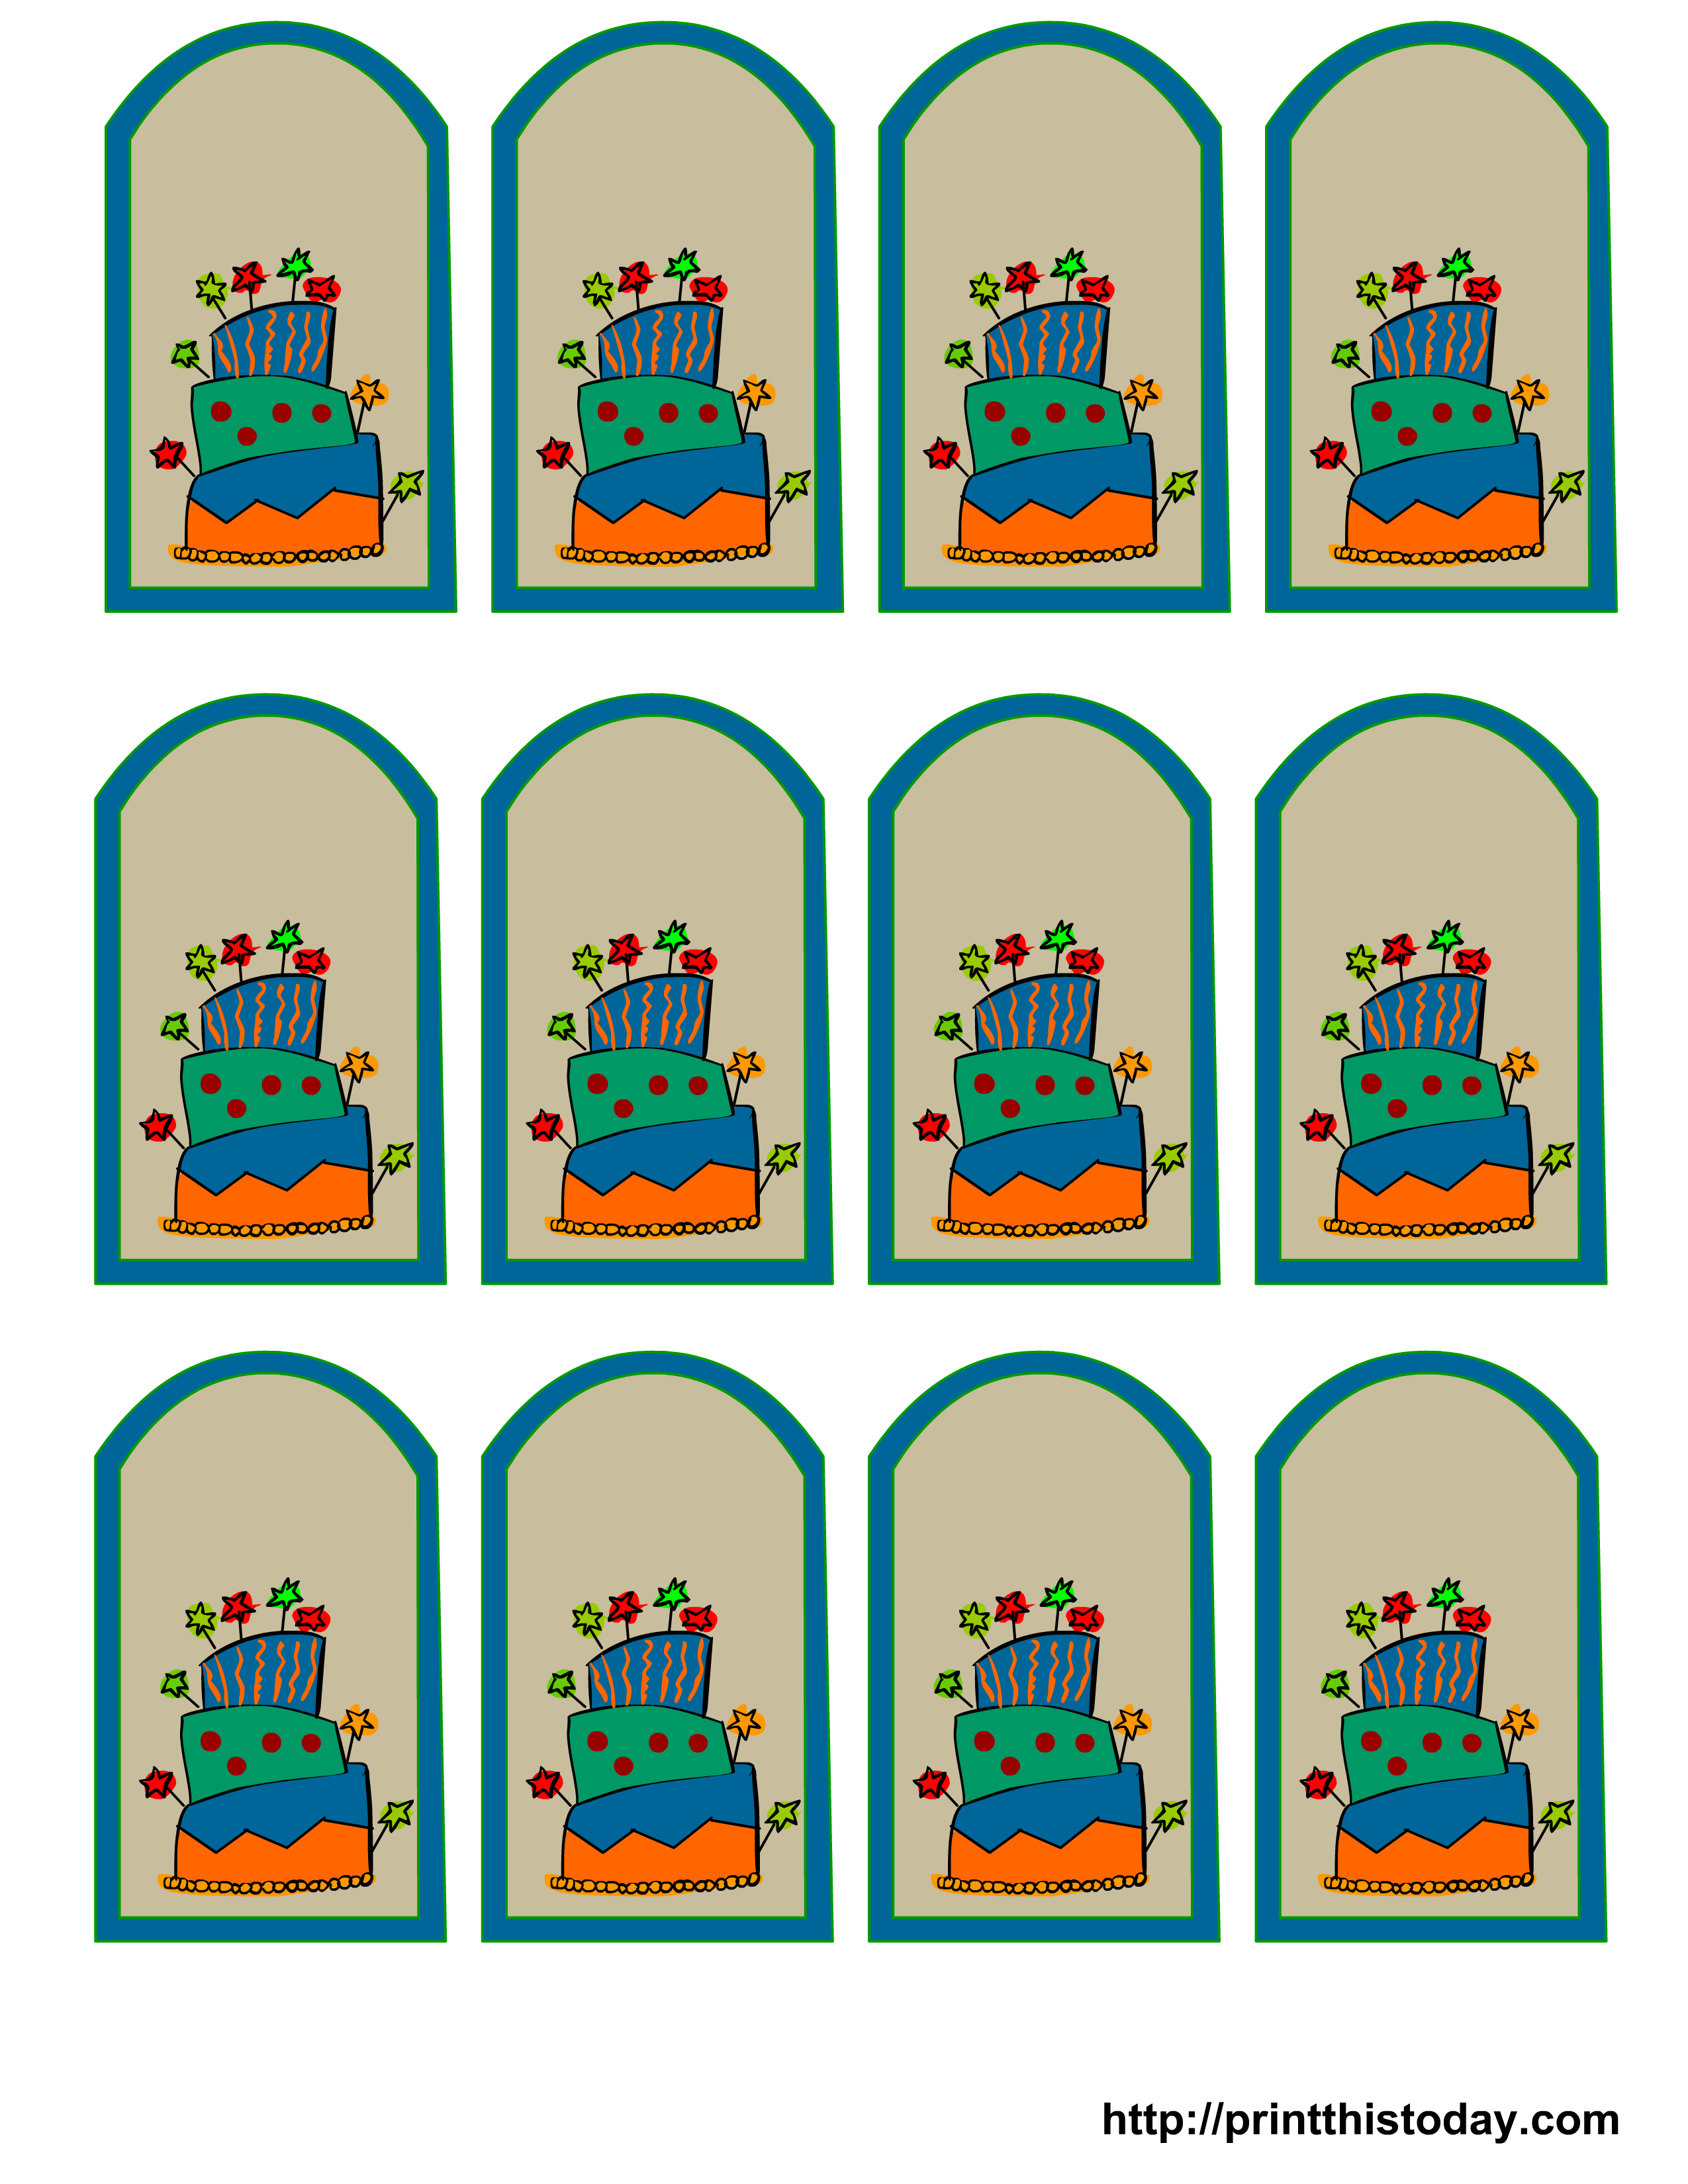 Free Printable Birthday Favor Tags - Birthday Party Favor Tags Printable Free